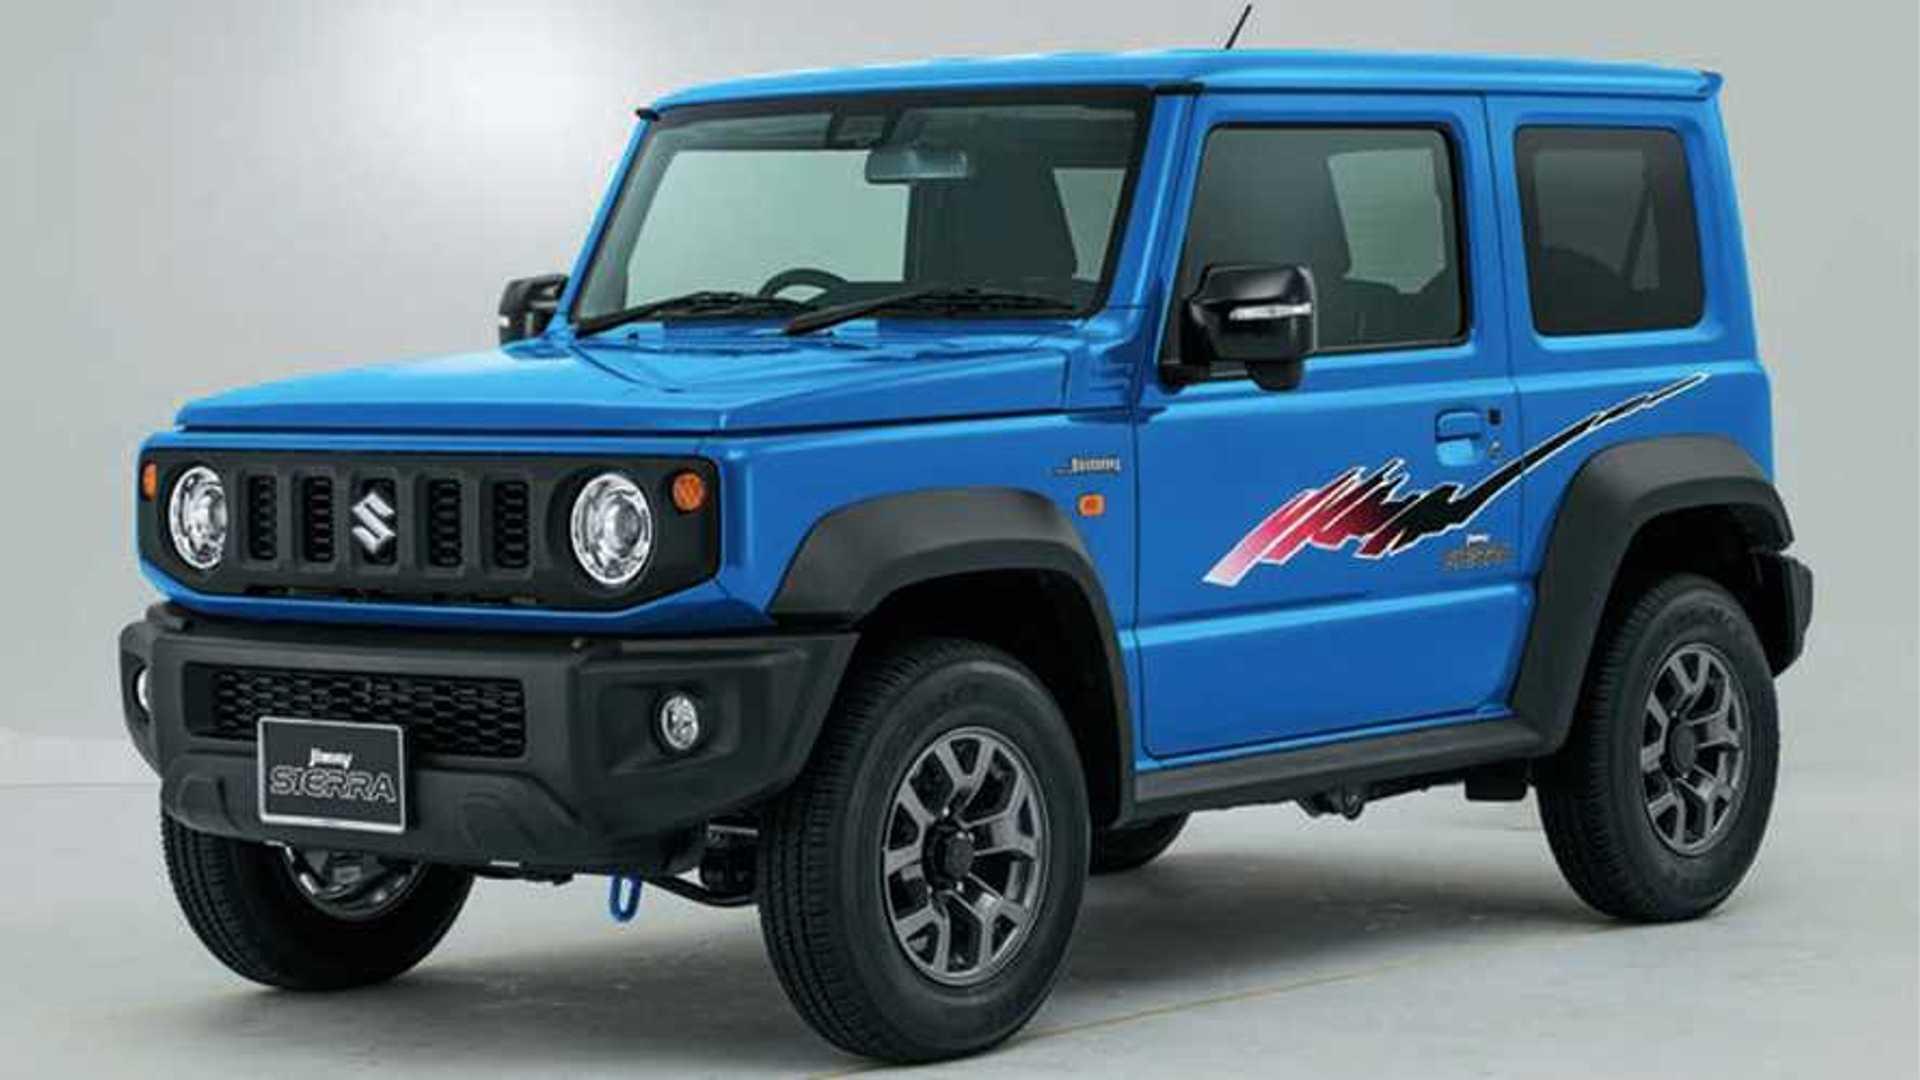 2021 Suzuki Jimny Pricing